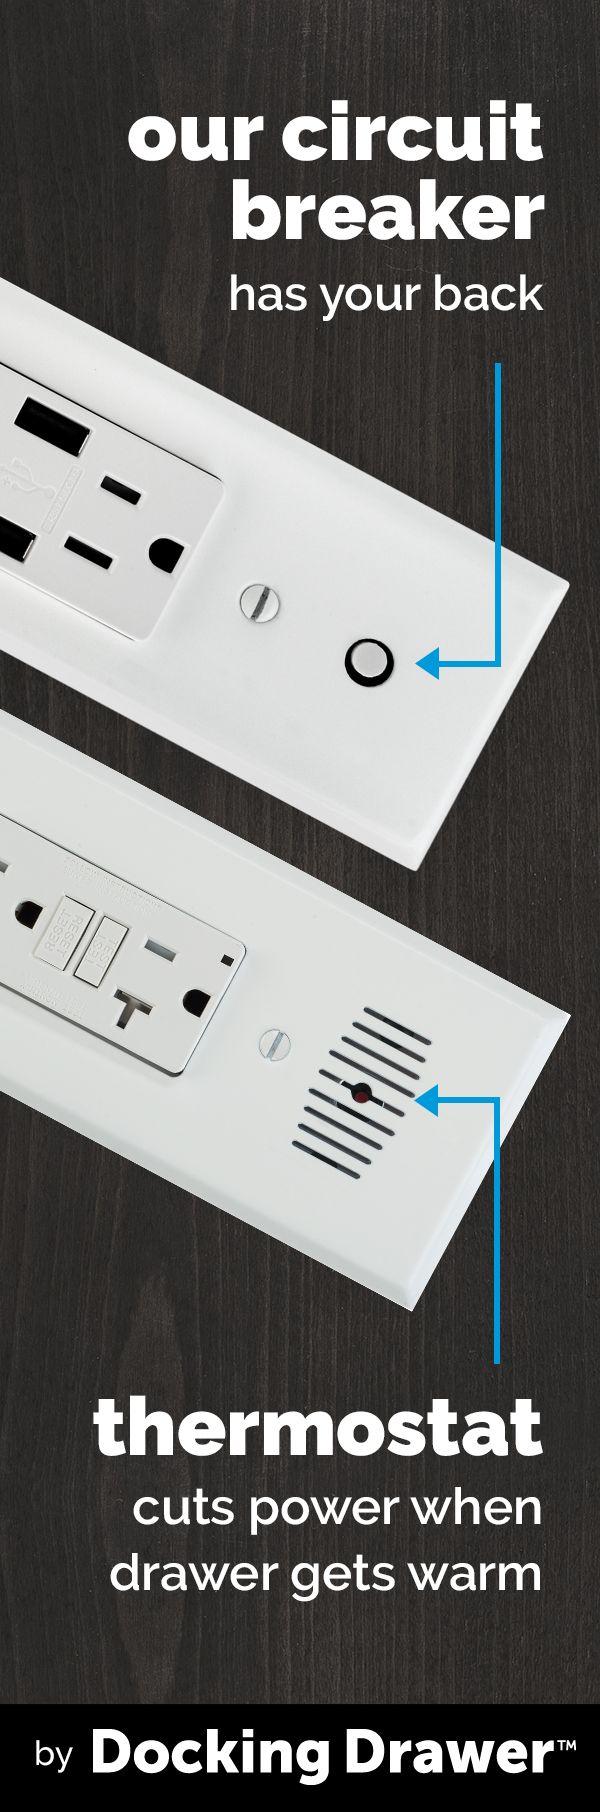 Docking Drawer Smart Simple Safe In Drawer Outlets Woodworking Materials Power Built In Desk